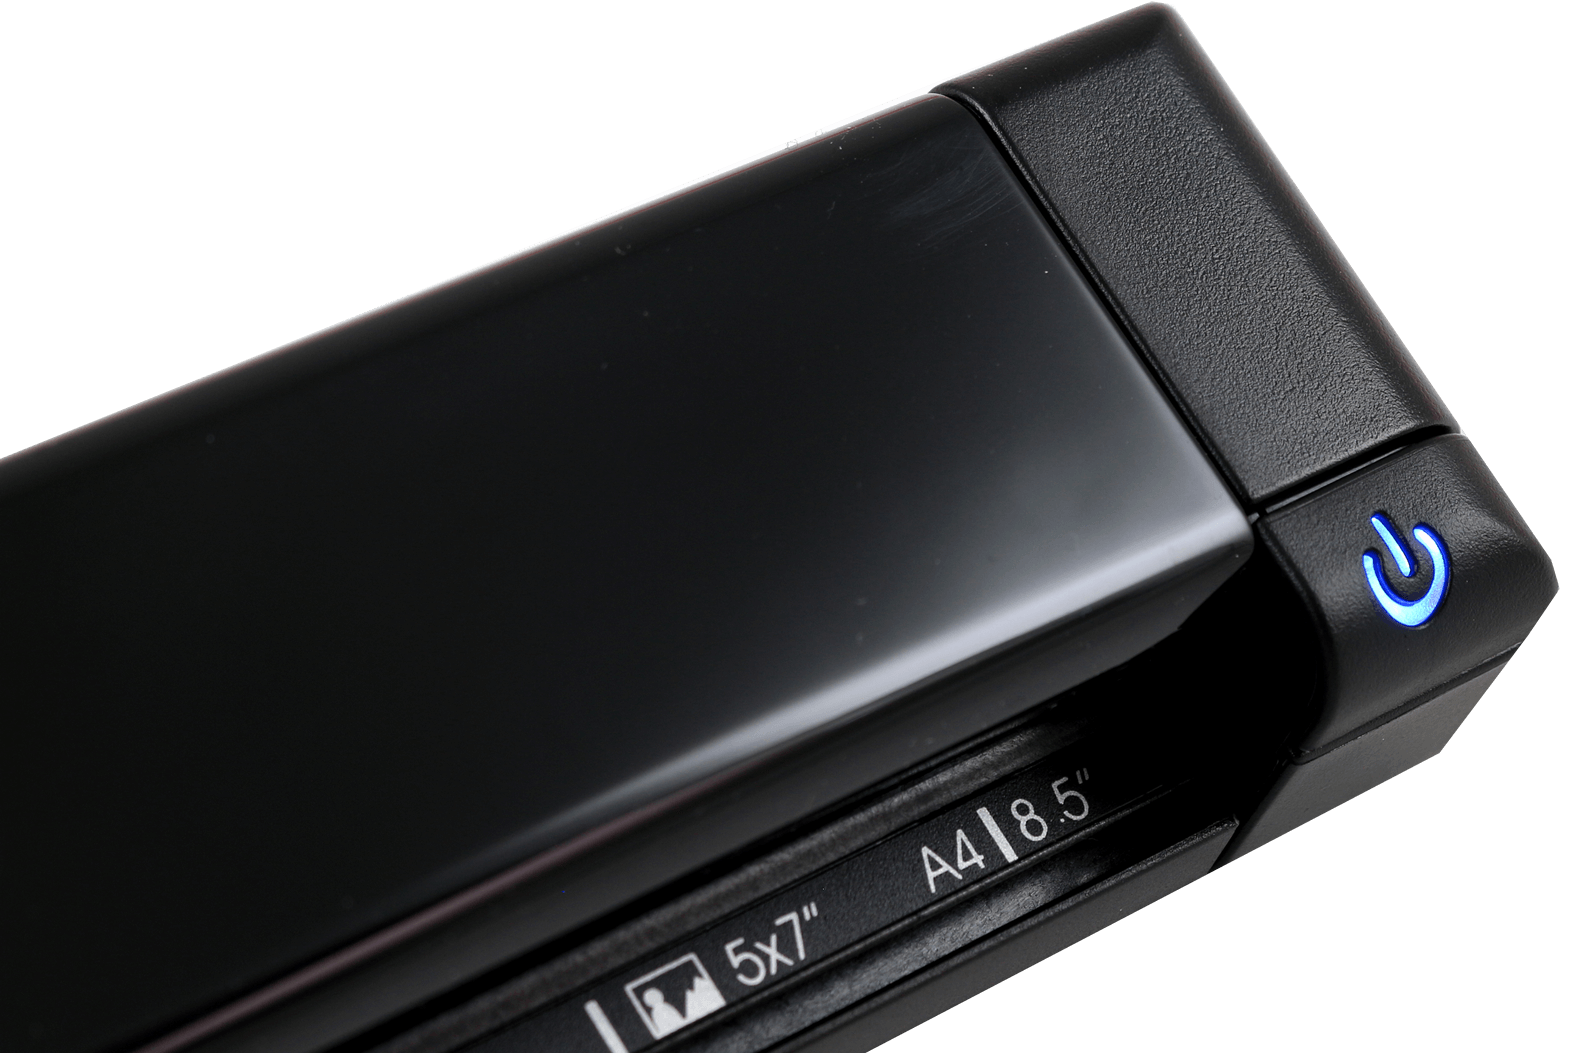 IRIScan Express 4 - Portable USB scanner